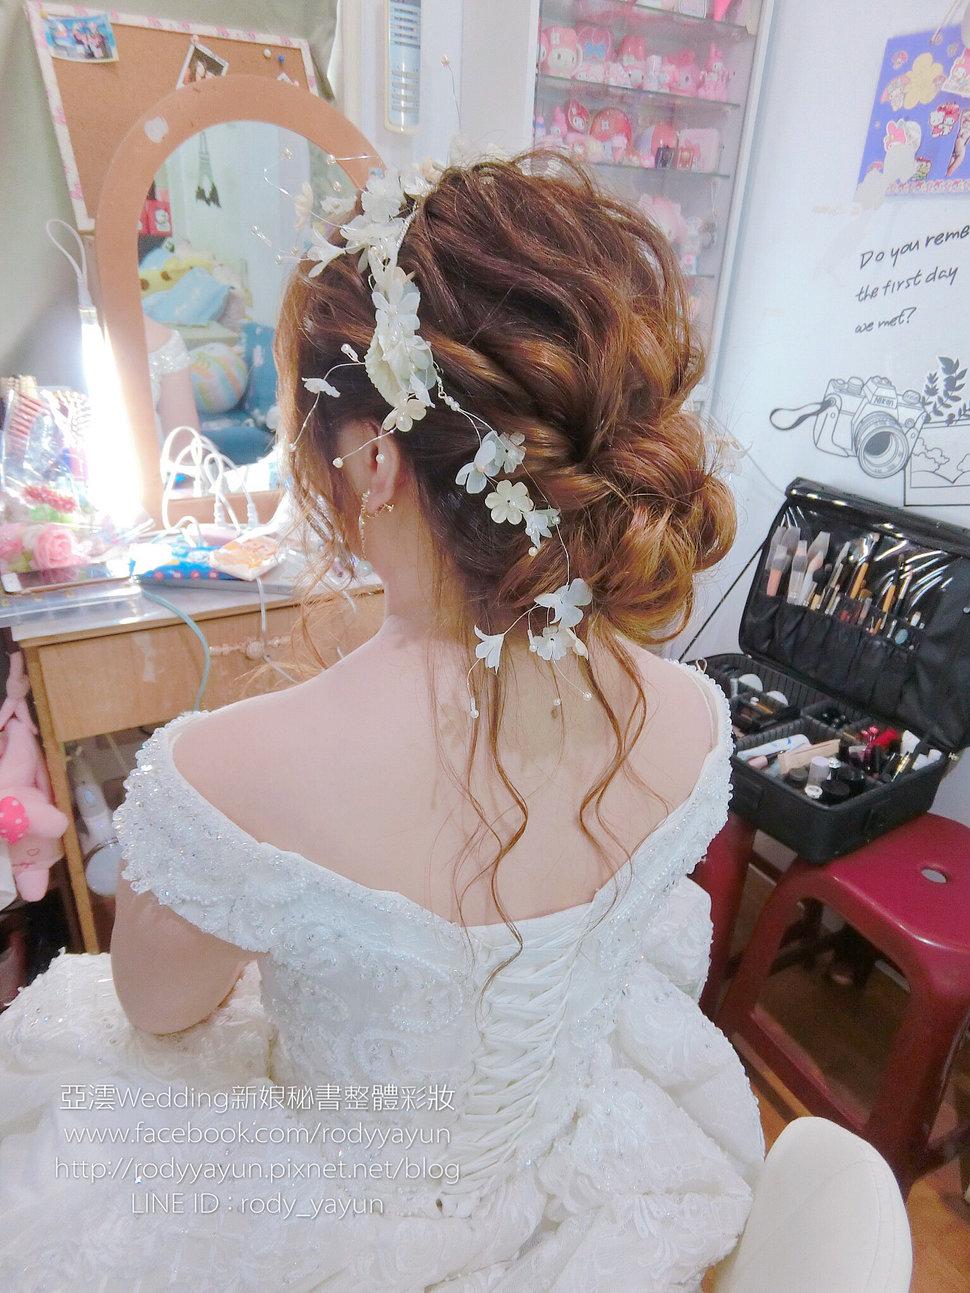 AF45DC51-4BF4-47B8-9854-DF6837C5F233 - 亞澐 Wedding 新娘秘書 整體彩妝《結婚吧》